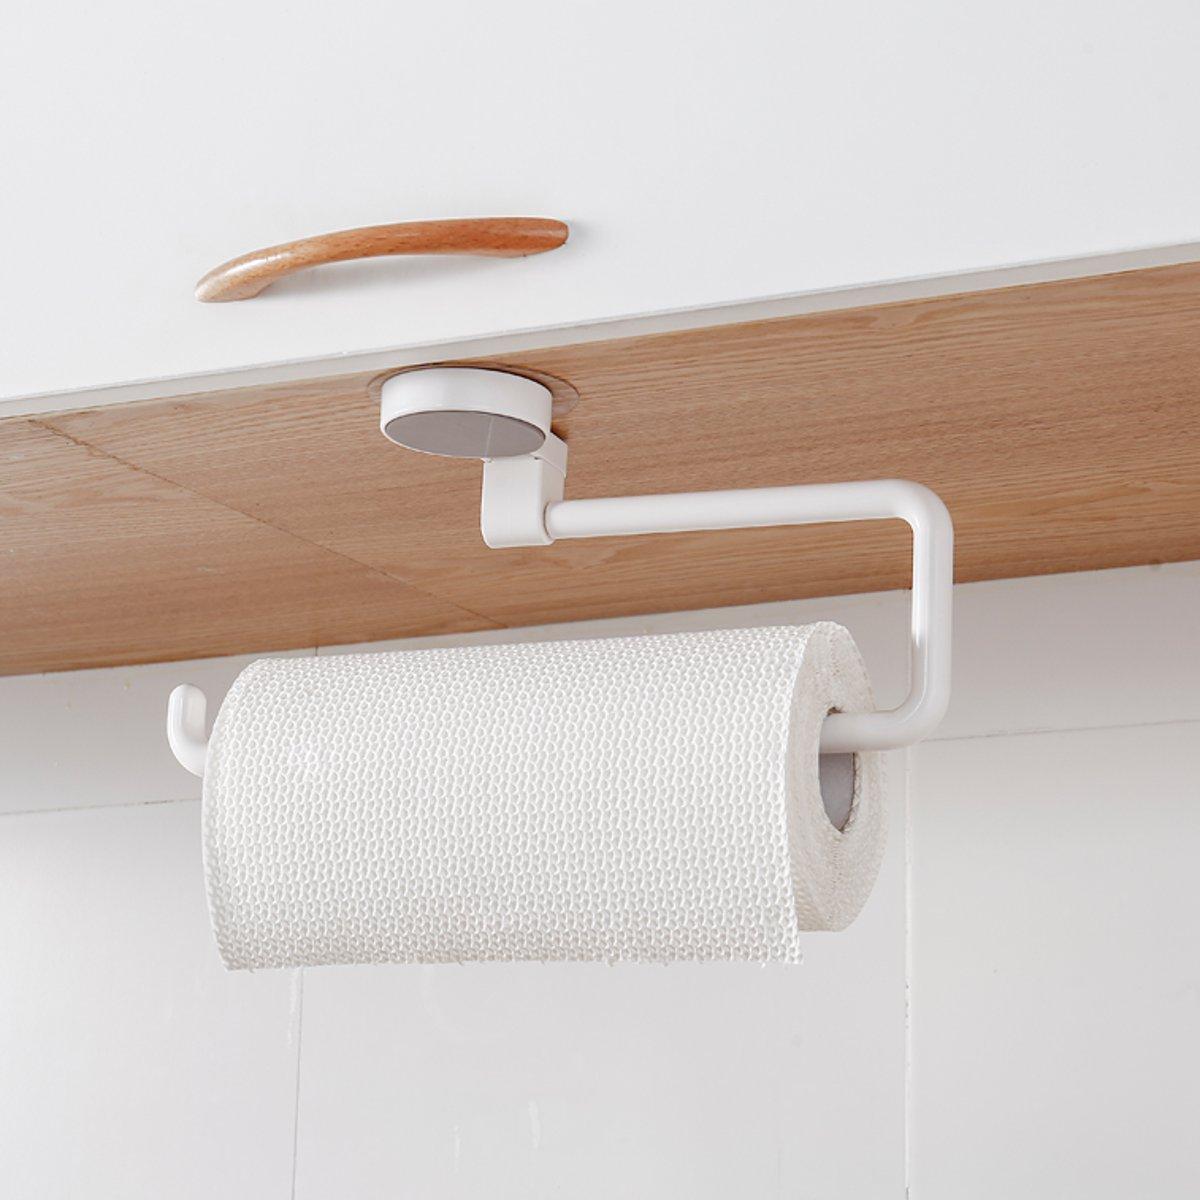 Kitchen Towel Hanger Toilet Cabinet Roll Paper Tissue Rack Holder Home Organizer